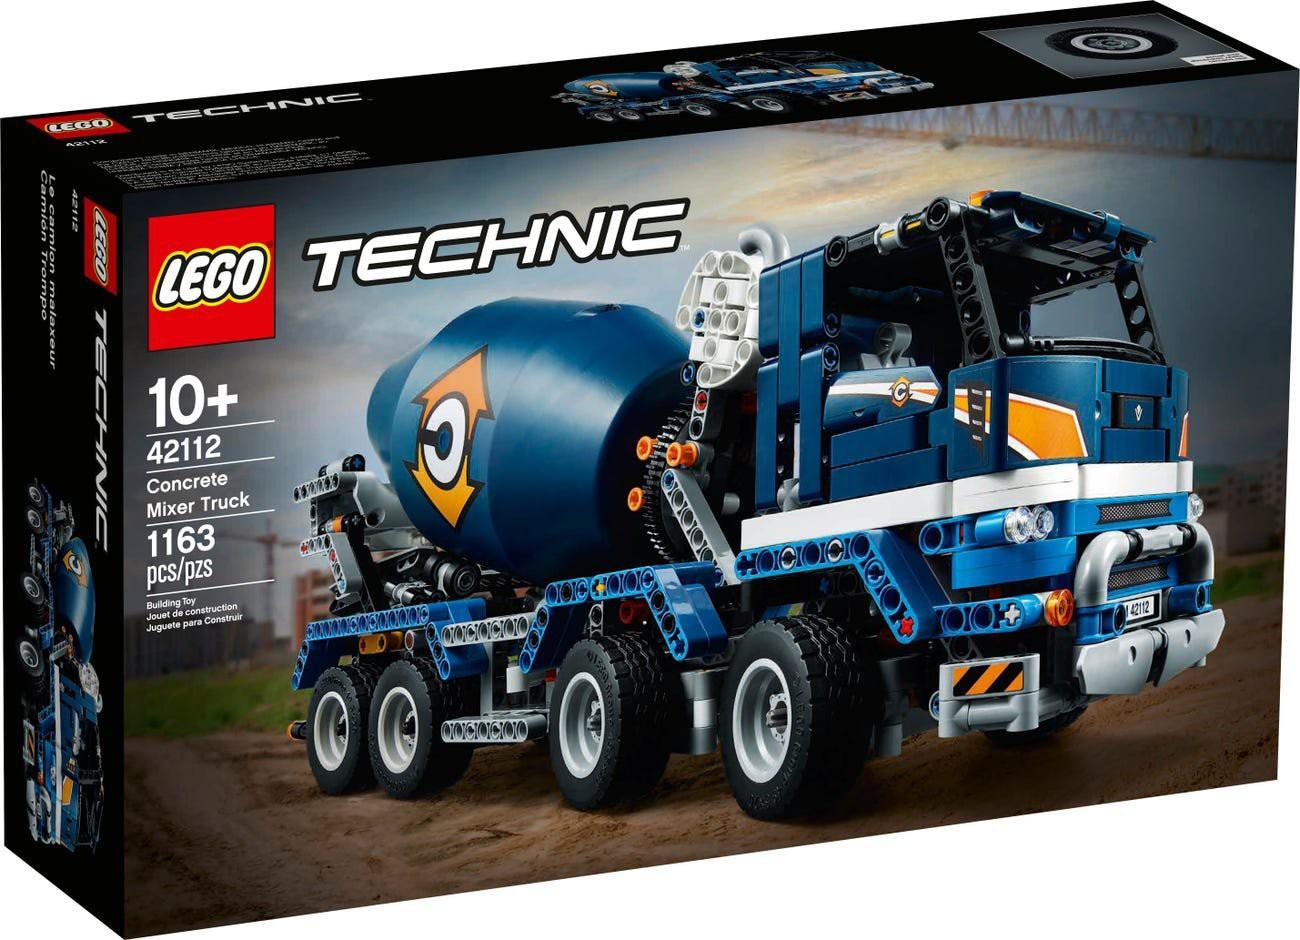 [Yasuee台灣] LEGO 樂高 42112 水泥攪拌車 混凝土攪拌運輸車 下單前請先詢問